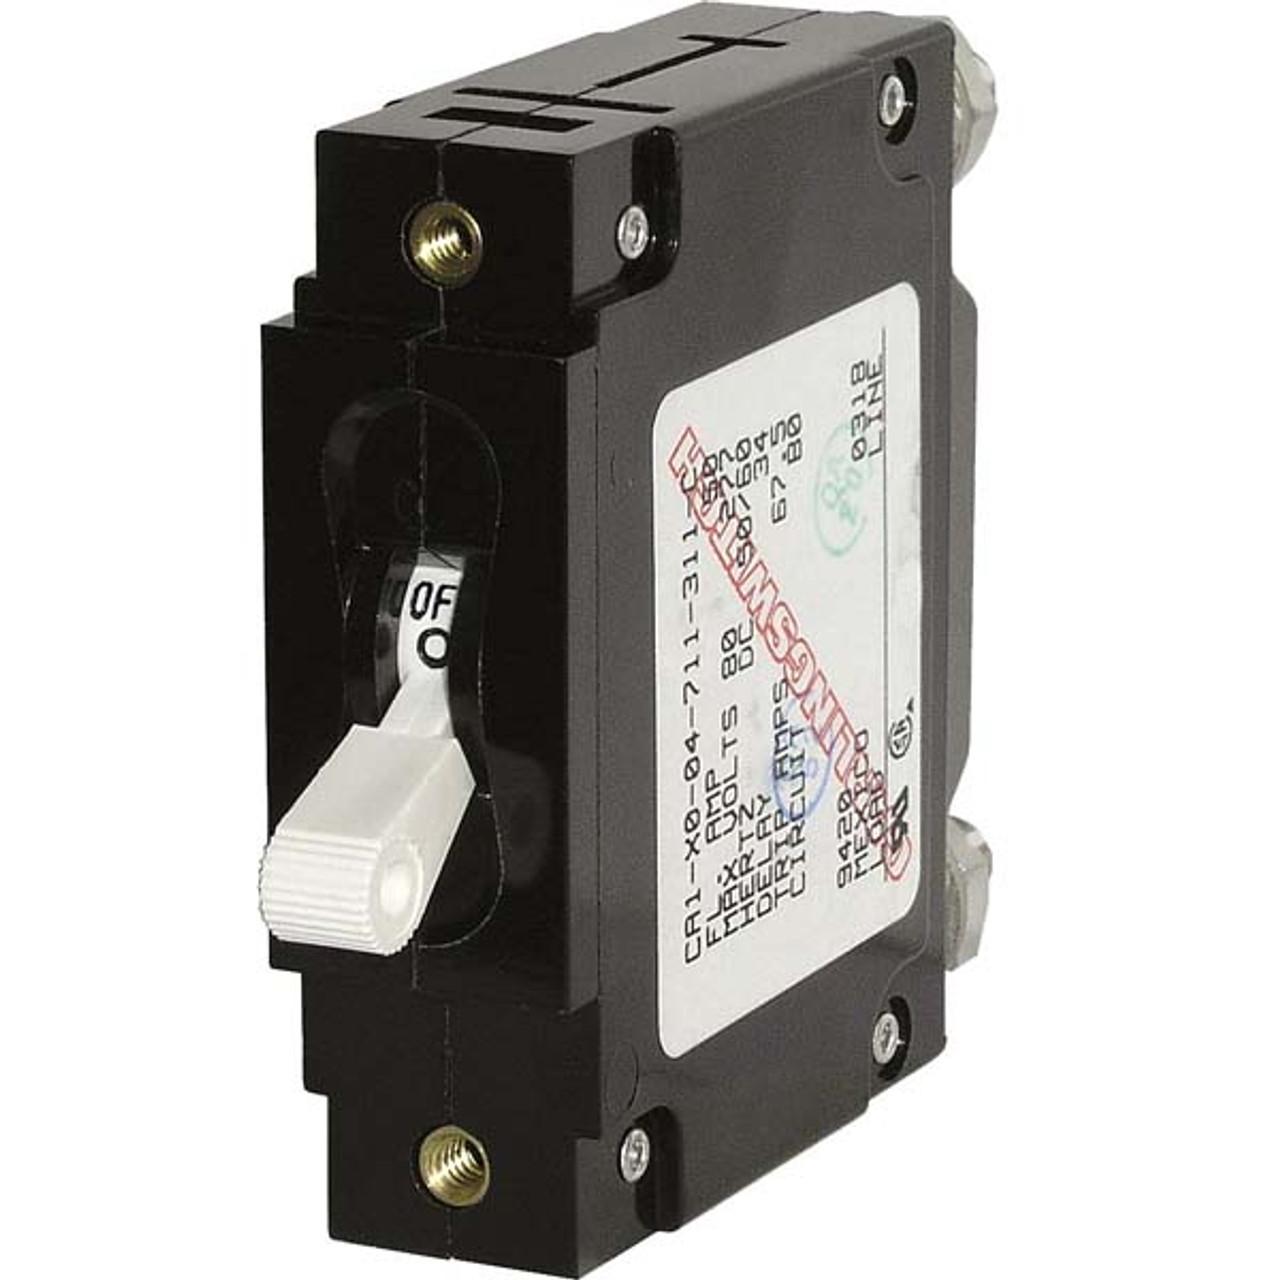 Single Pole 25 Amp Blue Sea C-Series White Toggle Circuit Breaker